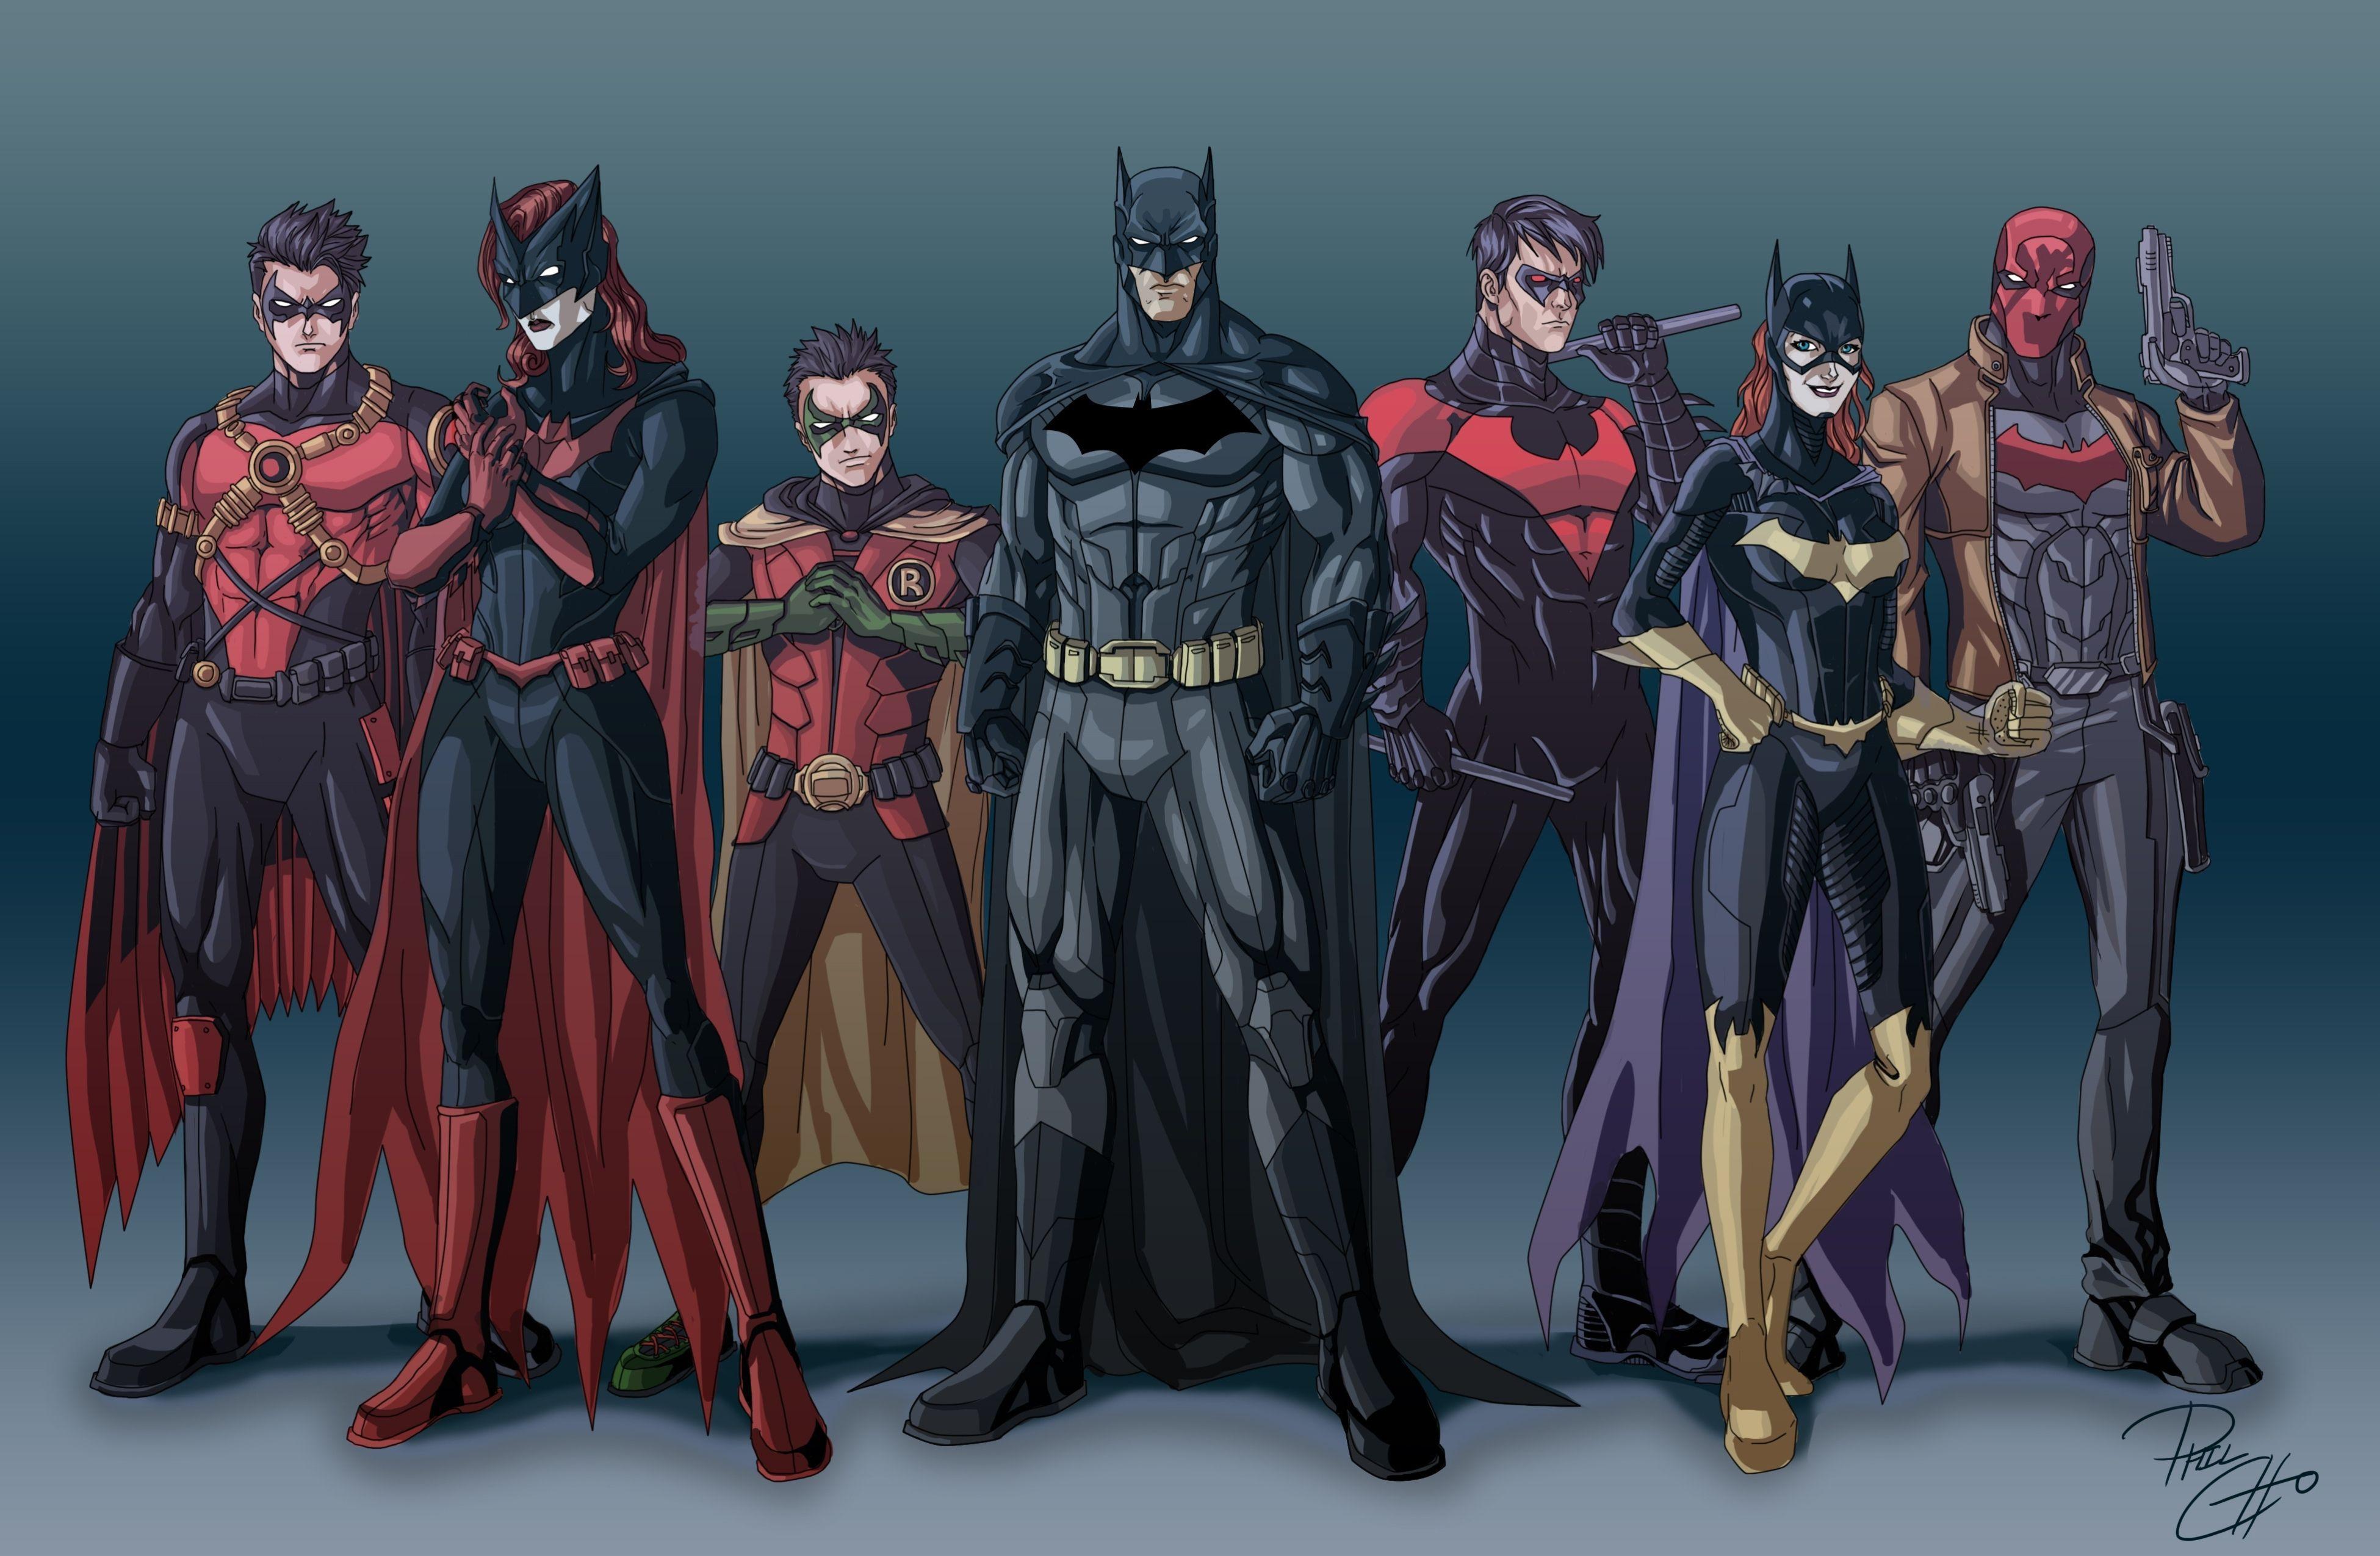 245 Robin (Batman) HD Wallpapers | Backgrounds - Wallpaper Abyss